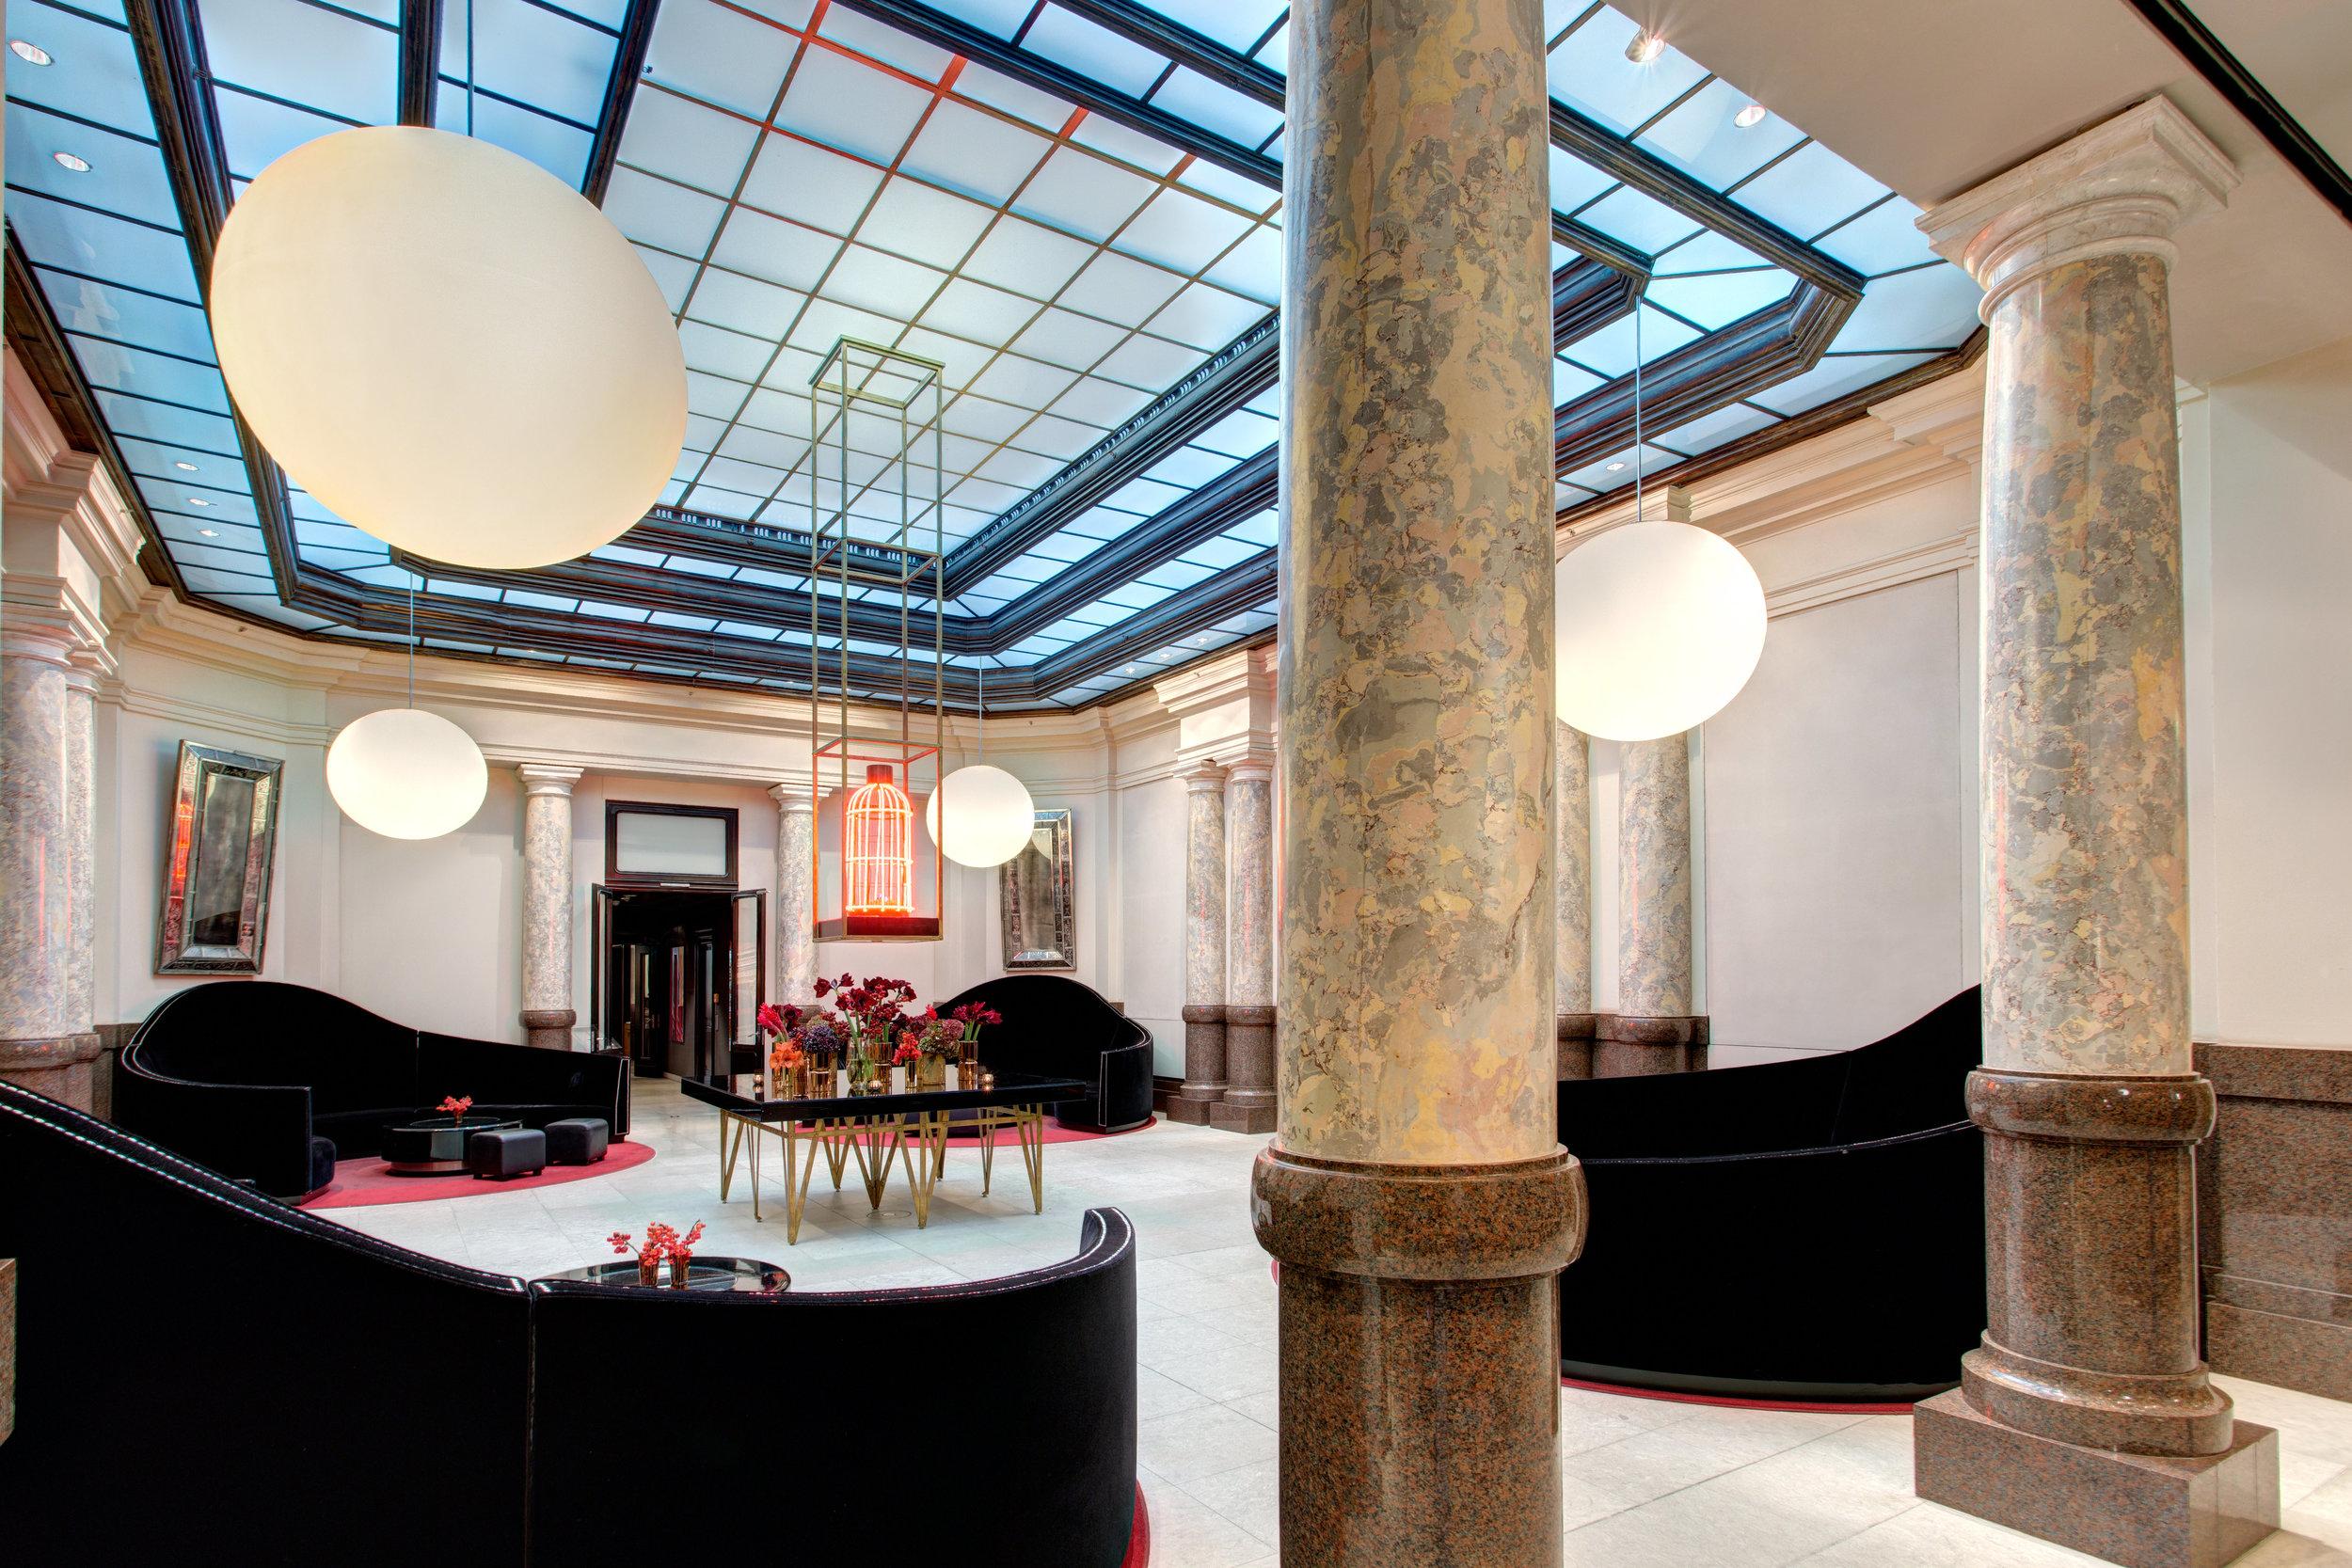 3 RFH Hotel de Rome - Lobby.jpg